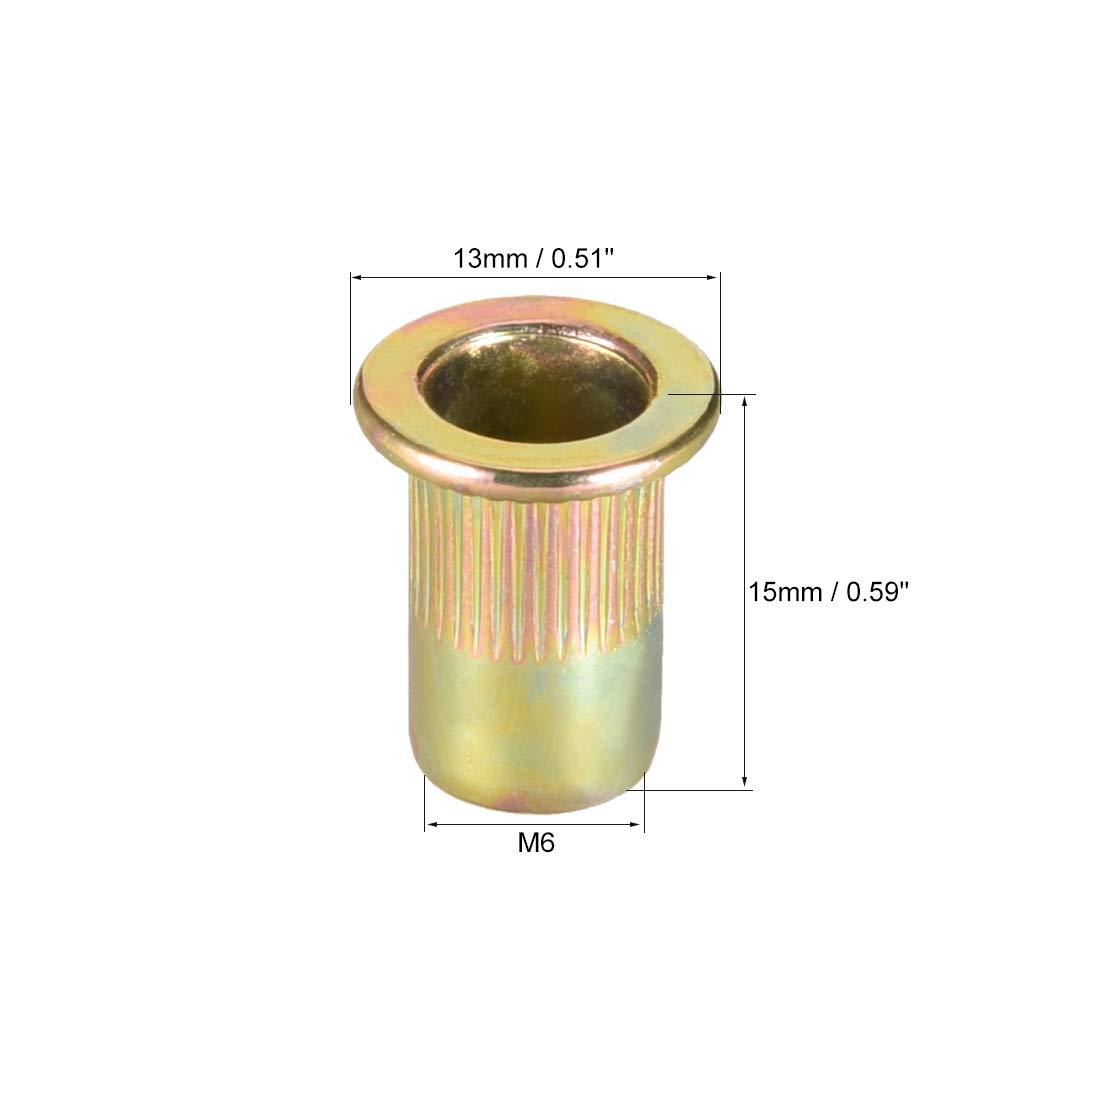 sourcing map Tuercas de remache de acero al carbono M10 tuerca de inserci/ón de cabeza plana chapado de zinc amarillo 30 Pcs